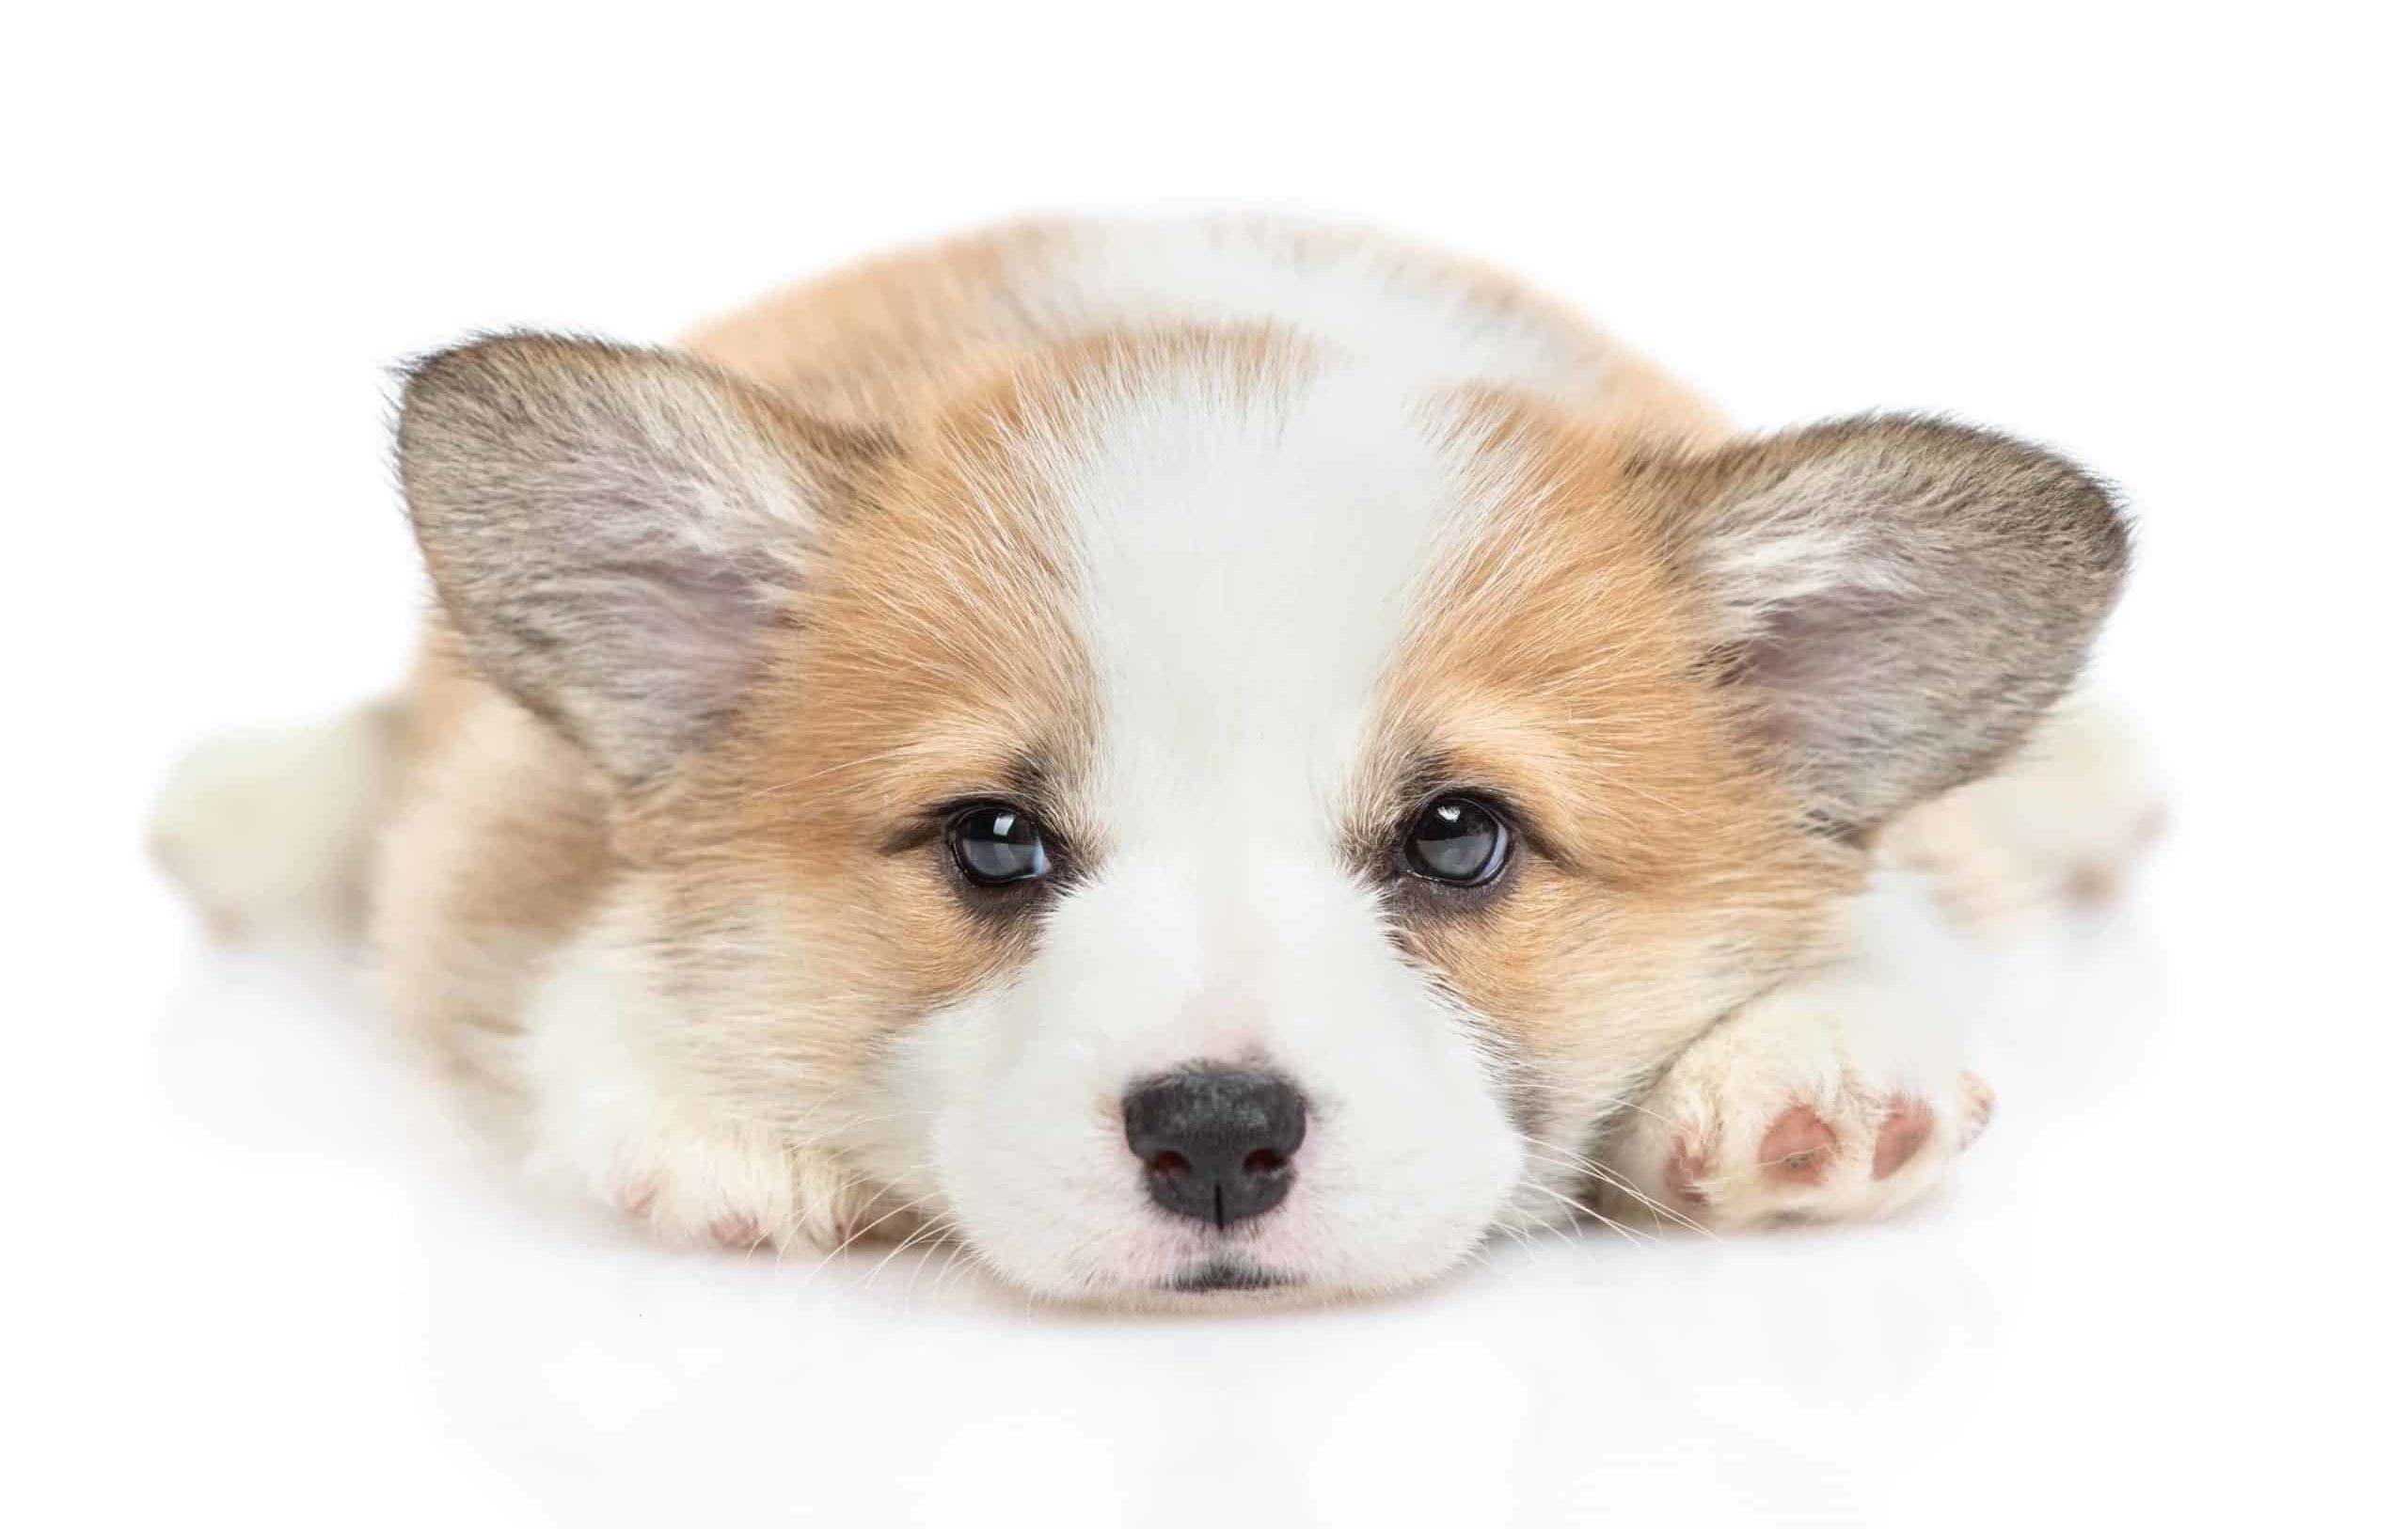 Sad corgi puppy on white background.